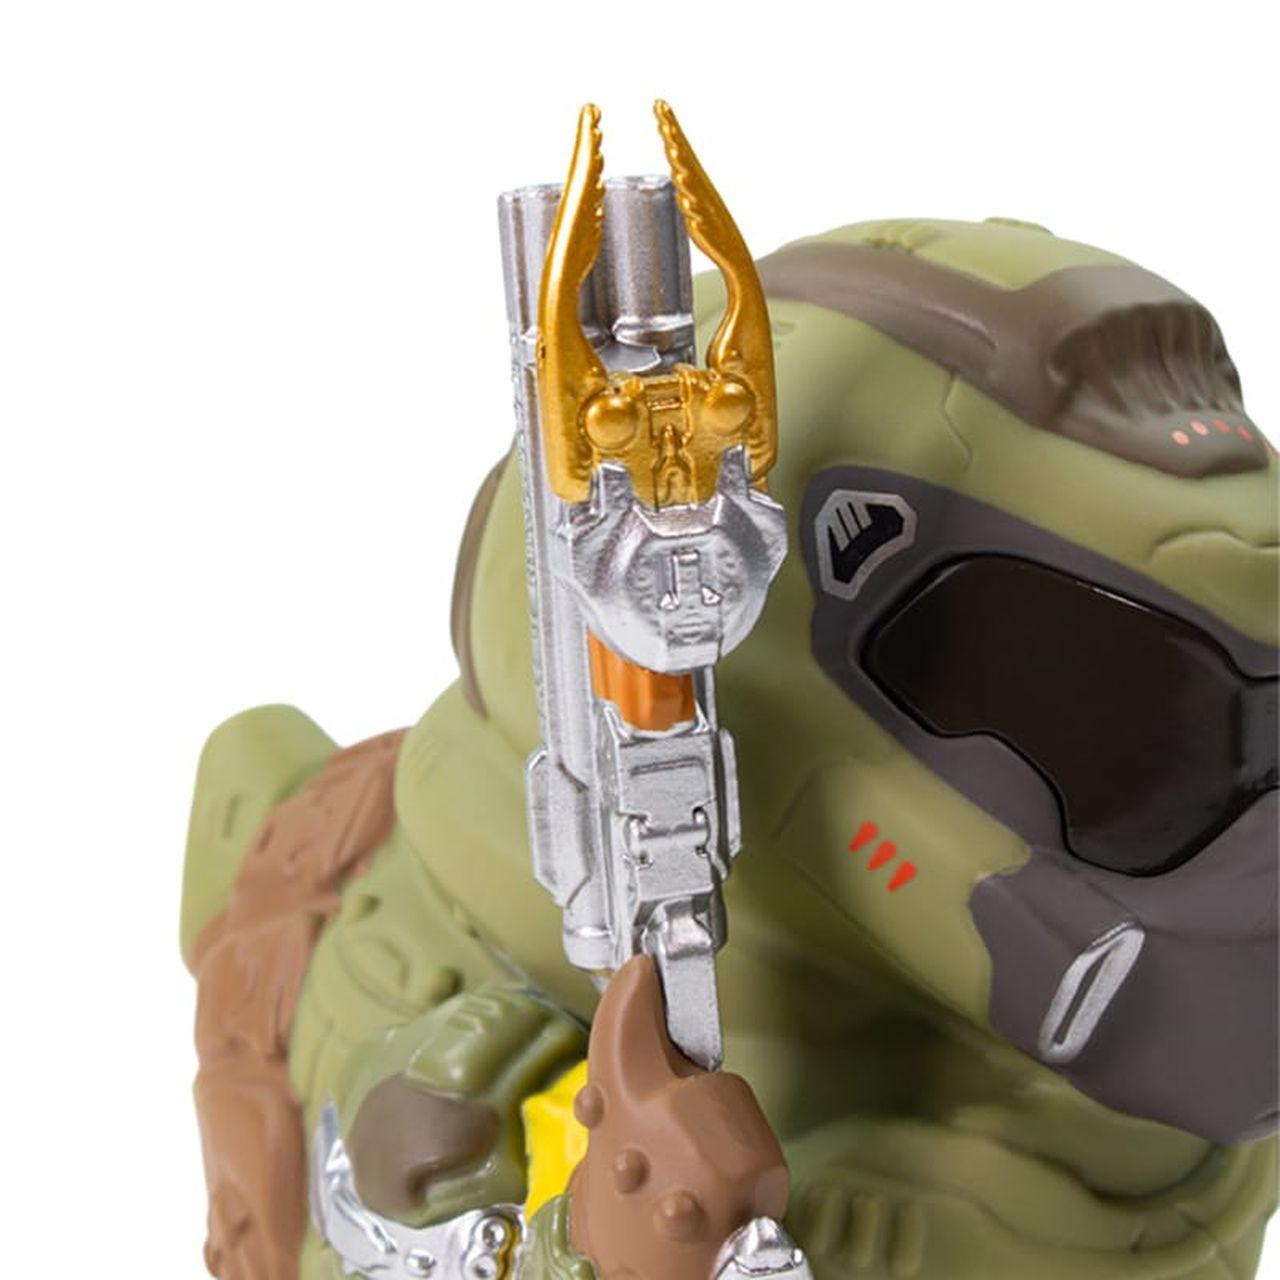 PRÉ VENDA: Tubbz Doom Slayer (Doomguy): Doom Eternal (Cosplaying Duck Collectible) Patinho Colecionável